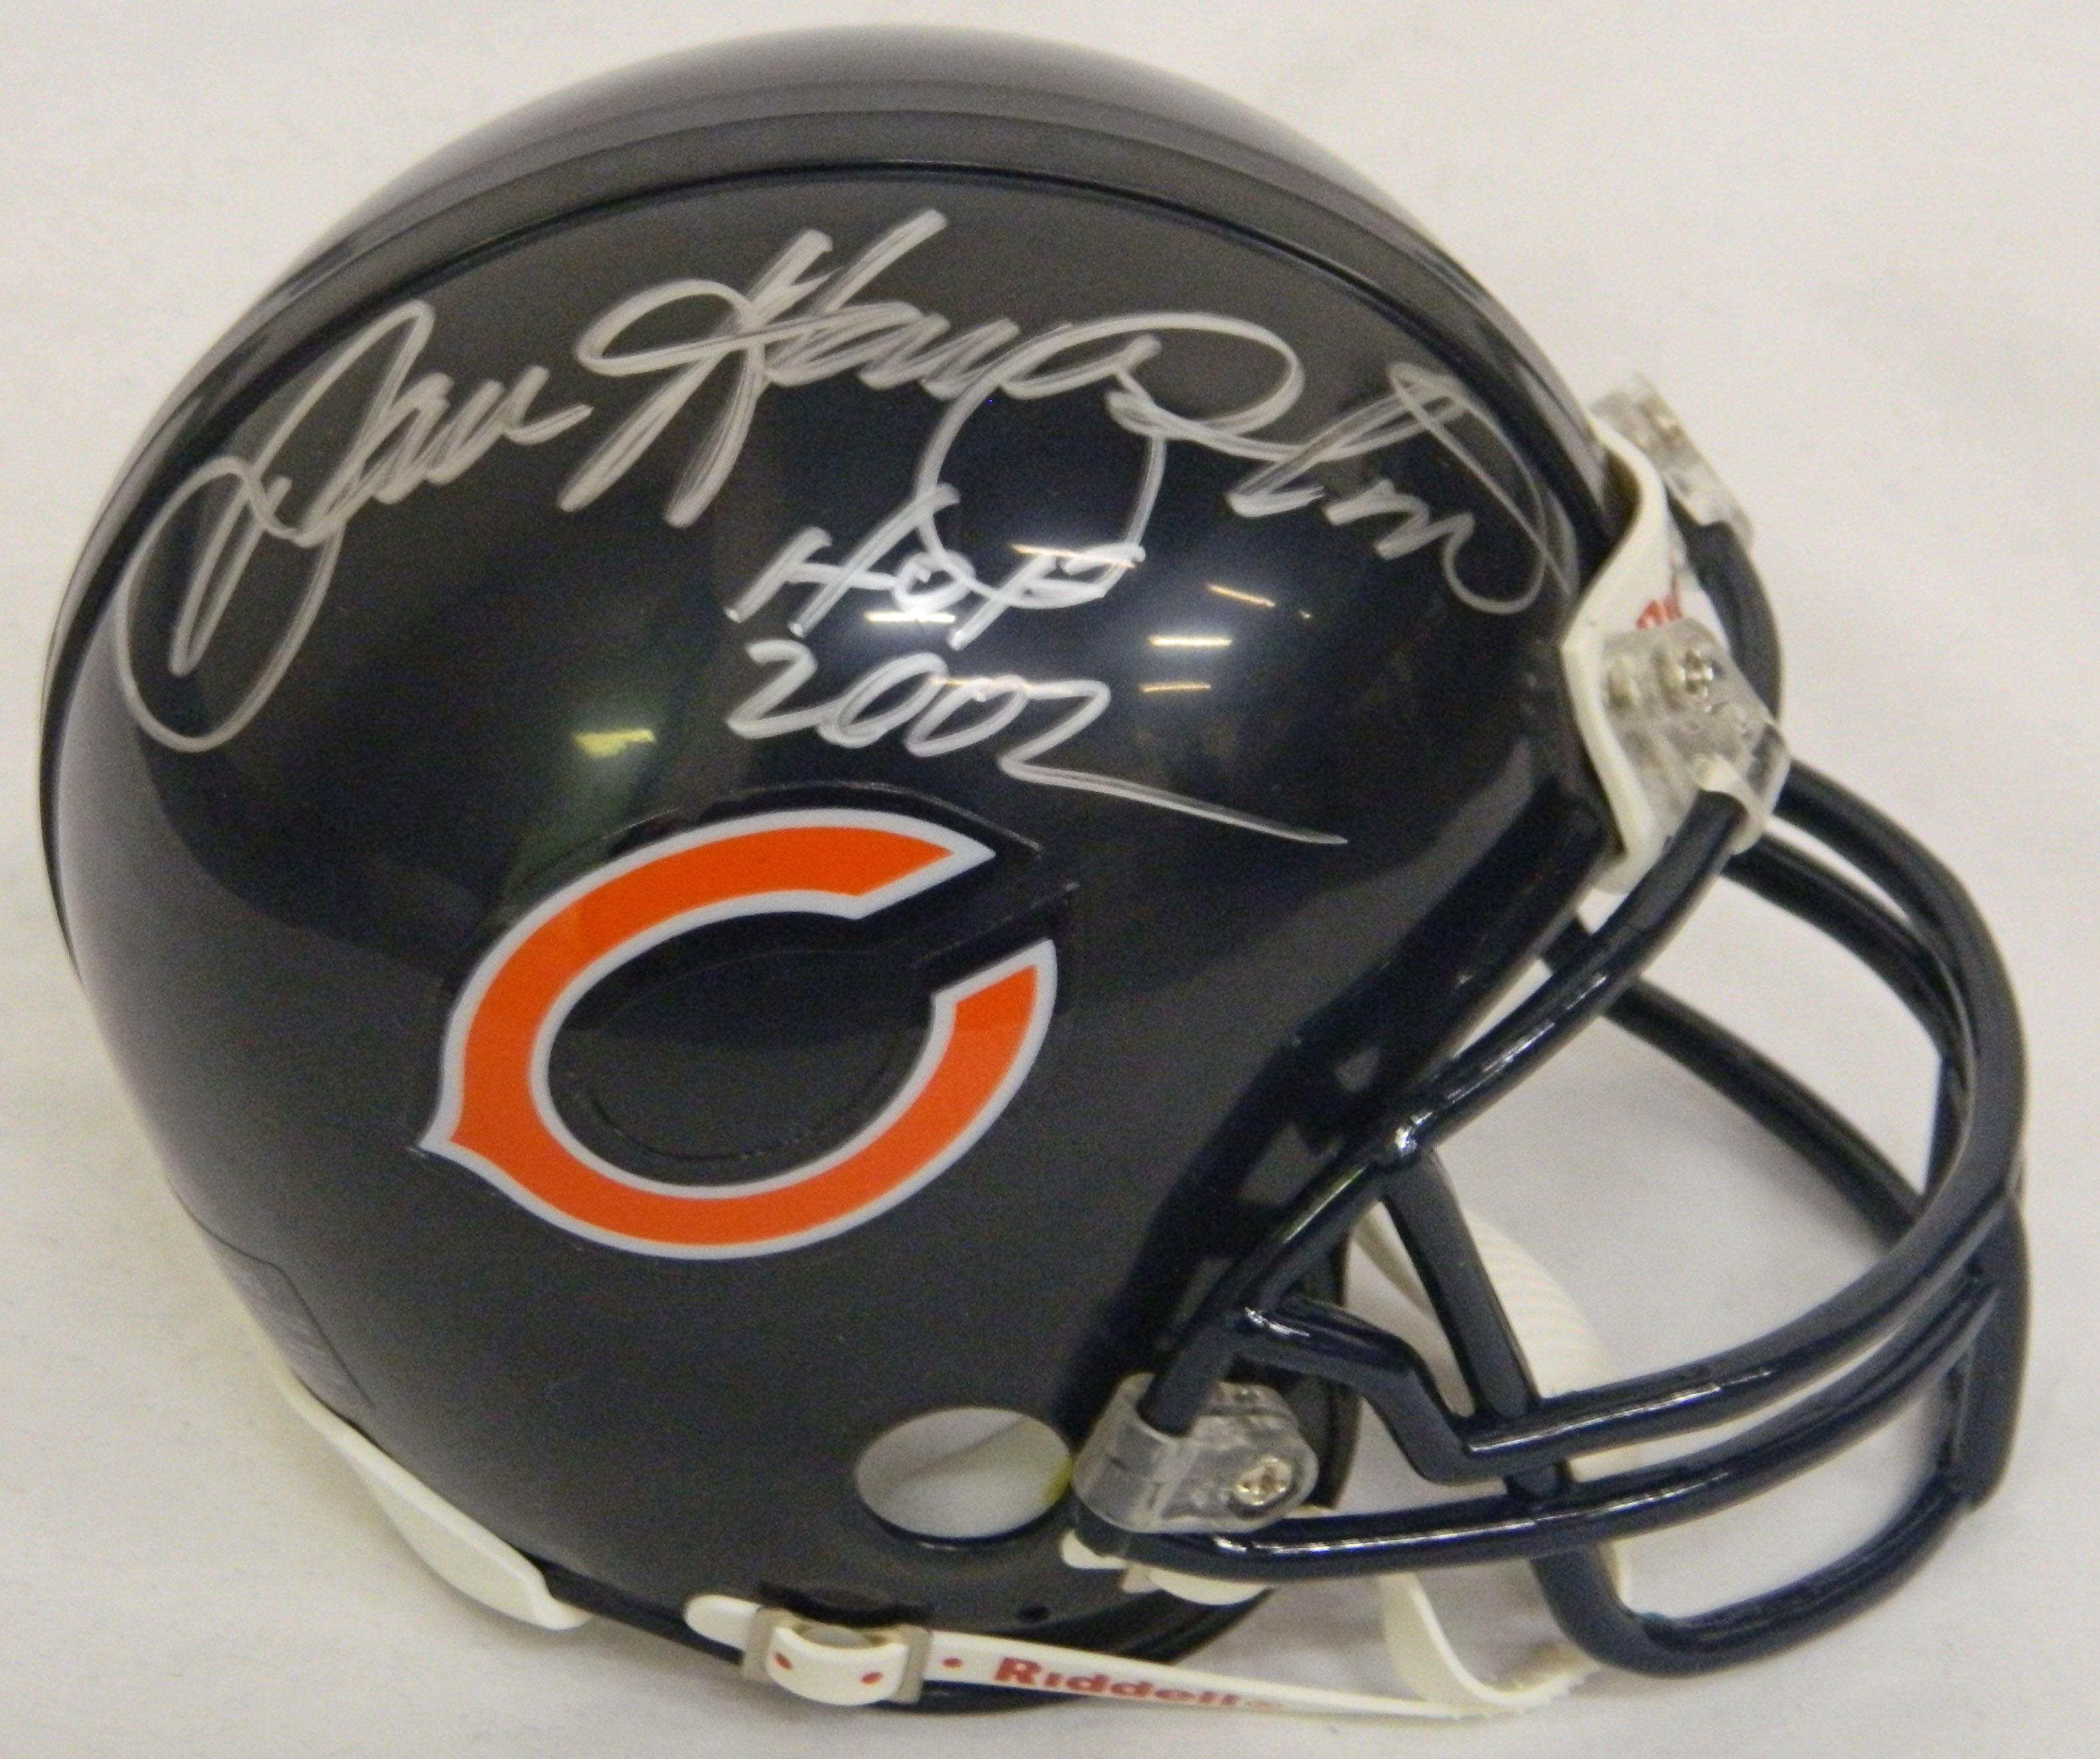 e99f64f9 Chicago Bears Autographed Memorabilia | Chicago Bears Signed Memorabilia